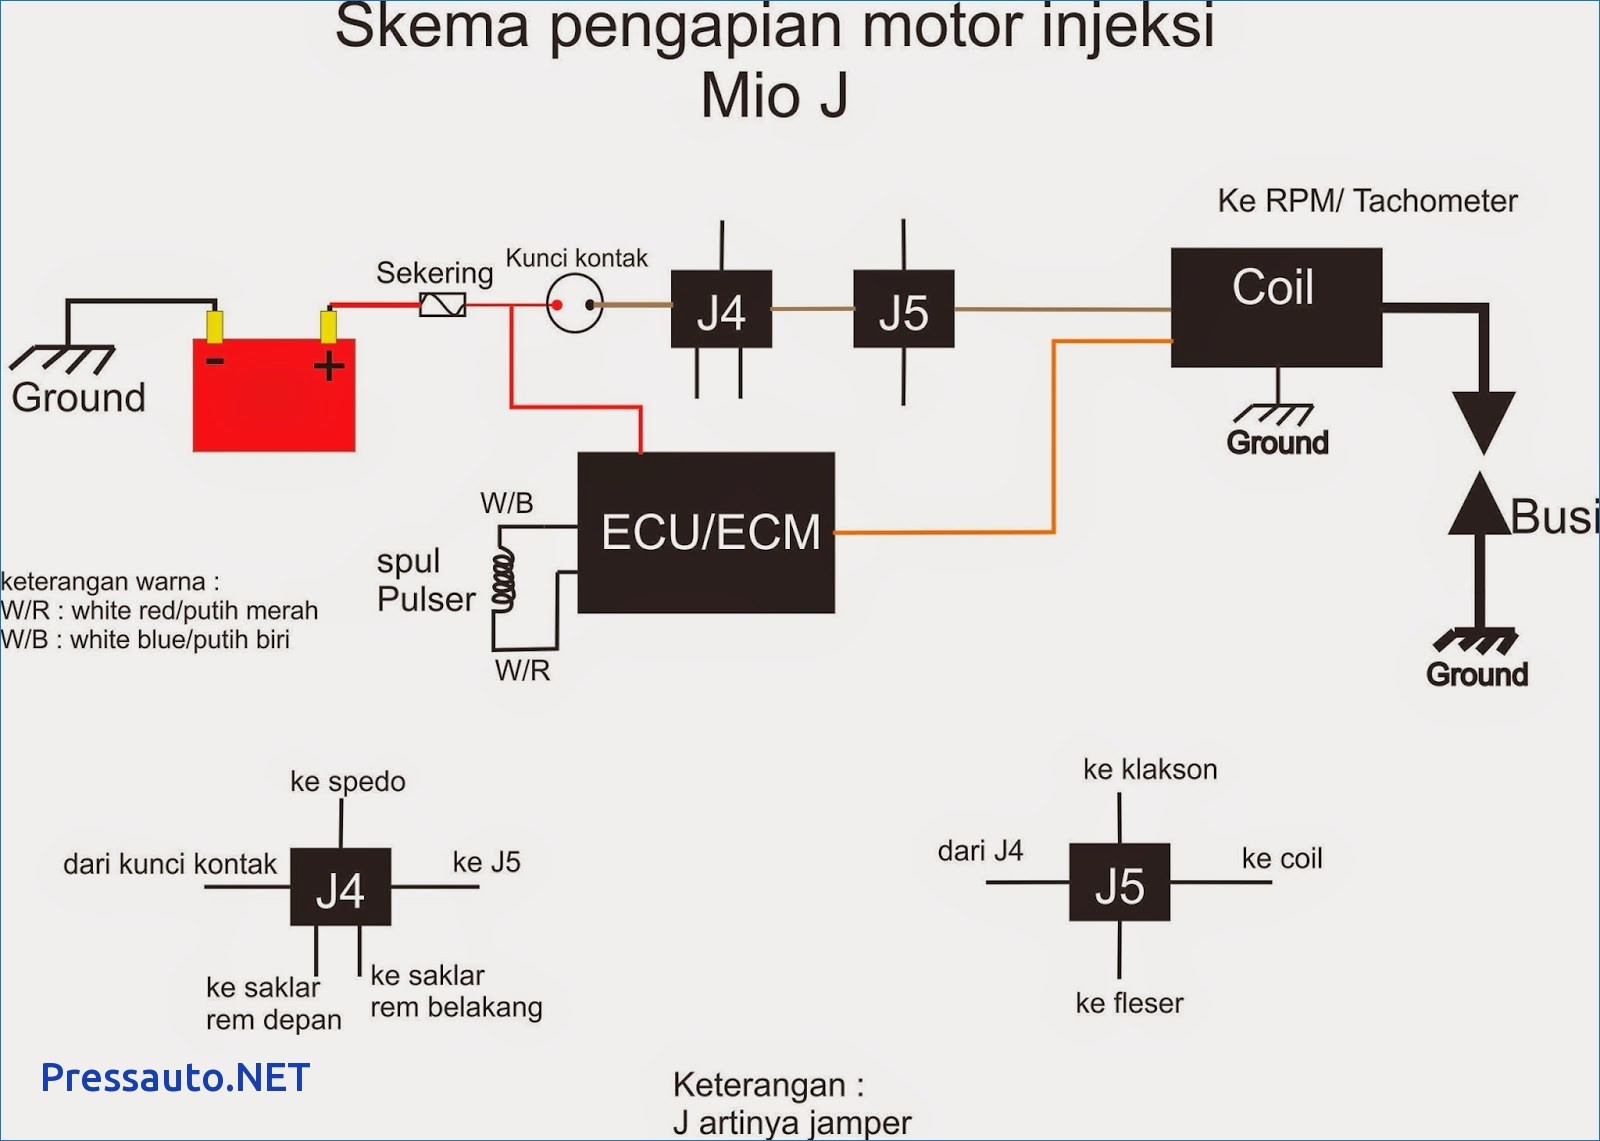 24 Volt Trolling Motor Battery Wiring Diagram - Wiring Diagram - 24 Volt Trolling Motor Battery Wiring Diagram